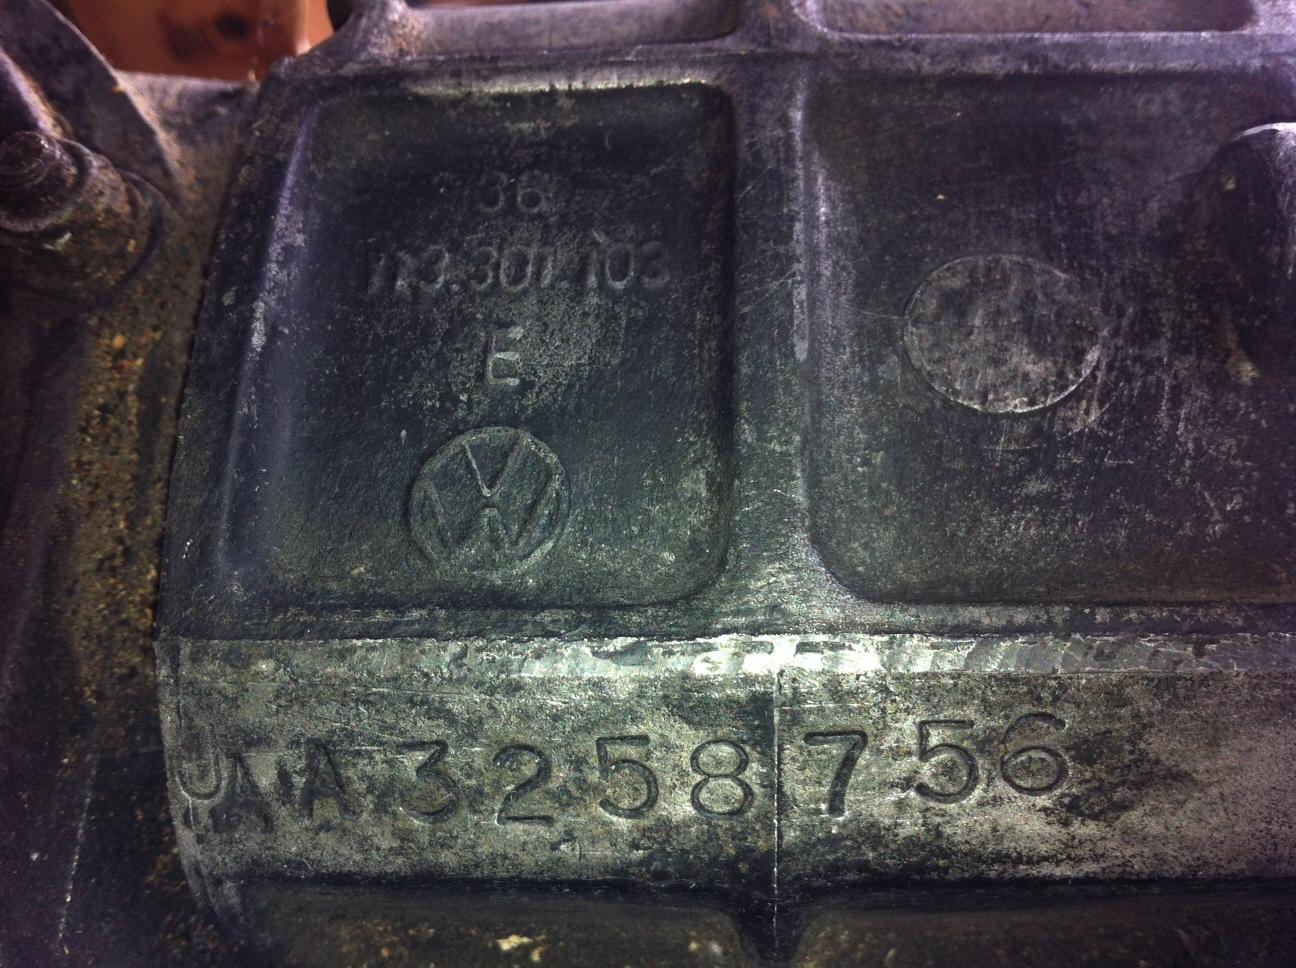 TheSamba com :: Beetle - 1958-1967 - View topic - VW Transaxle ID